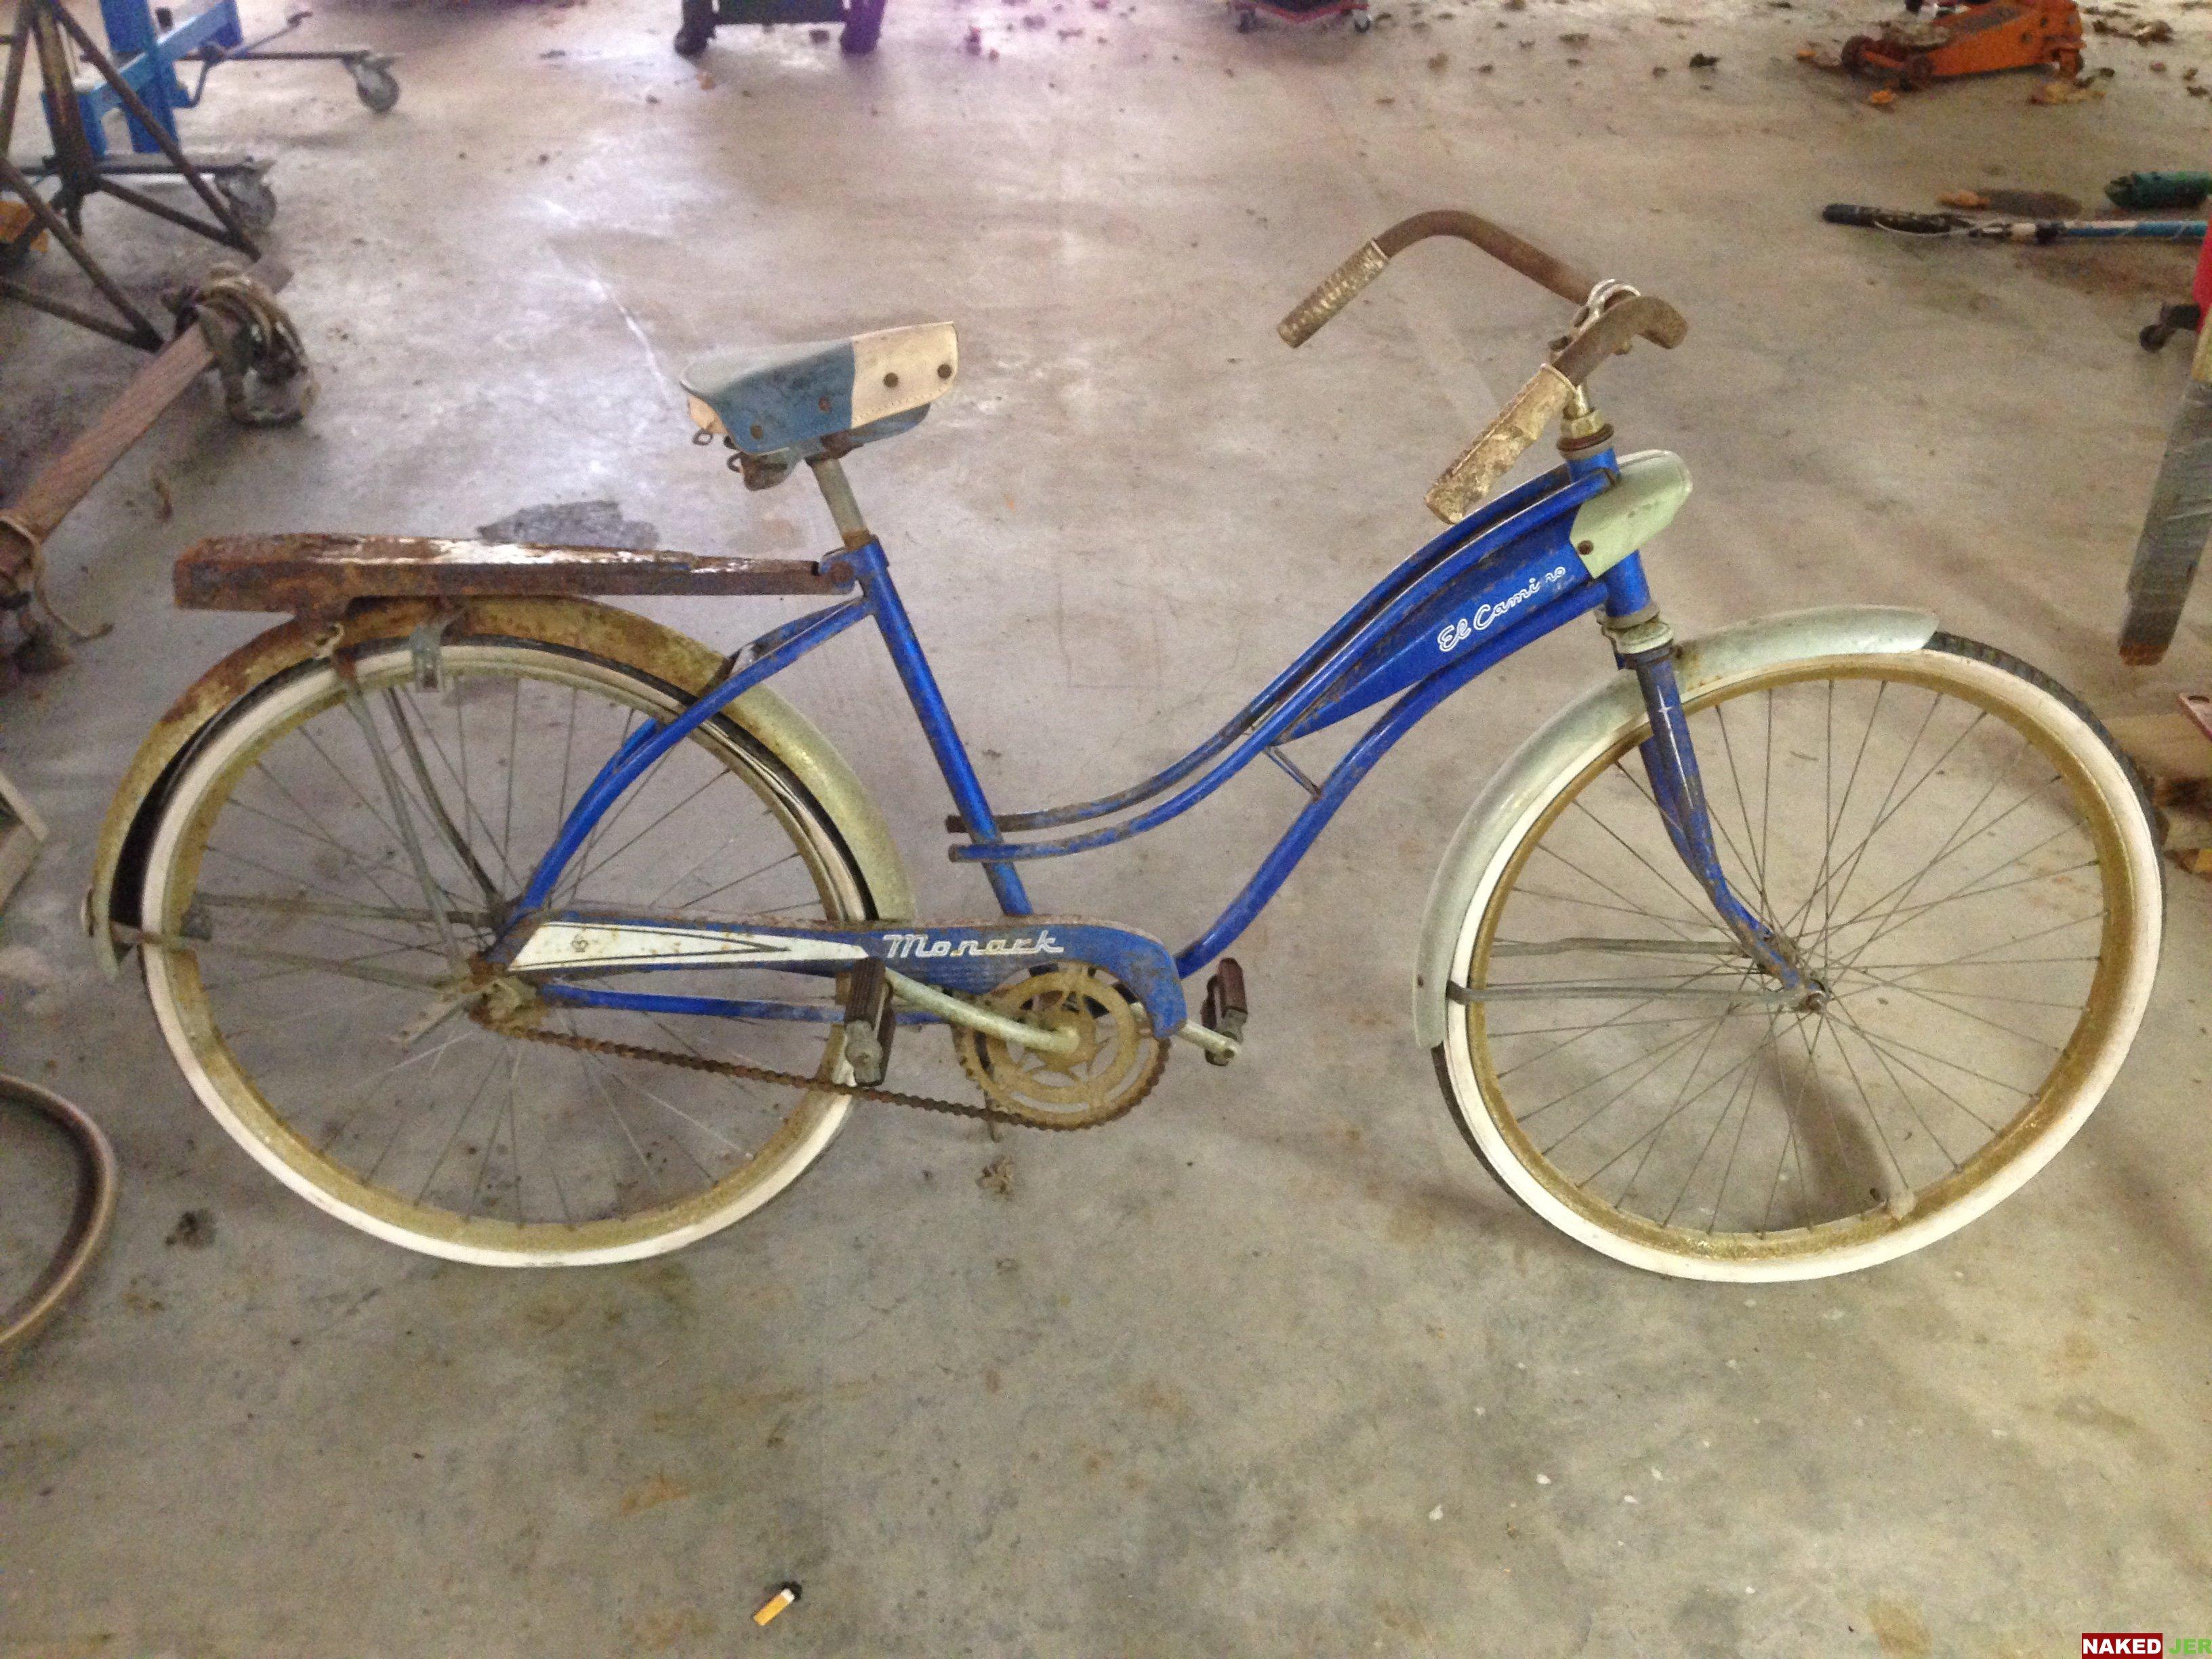 1962 Blue Monarch El Camino Girls Beach Cruiser $70